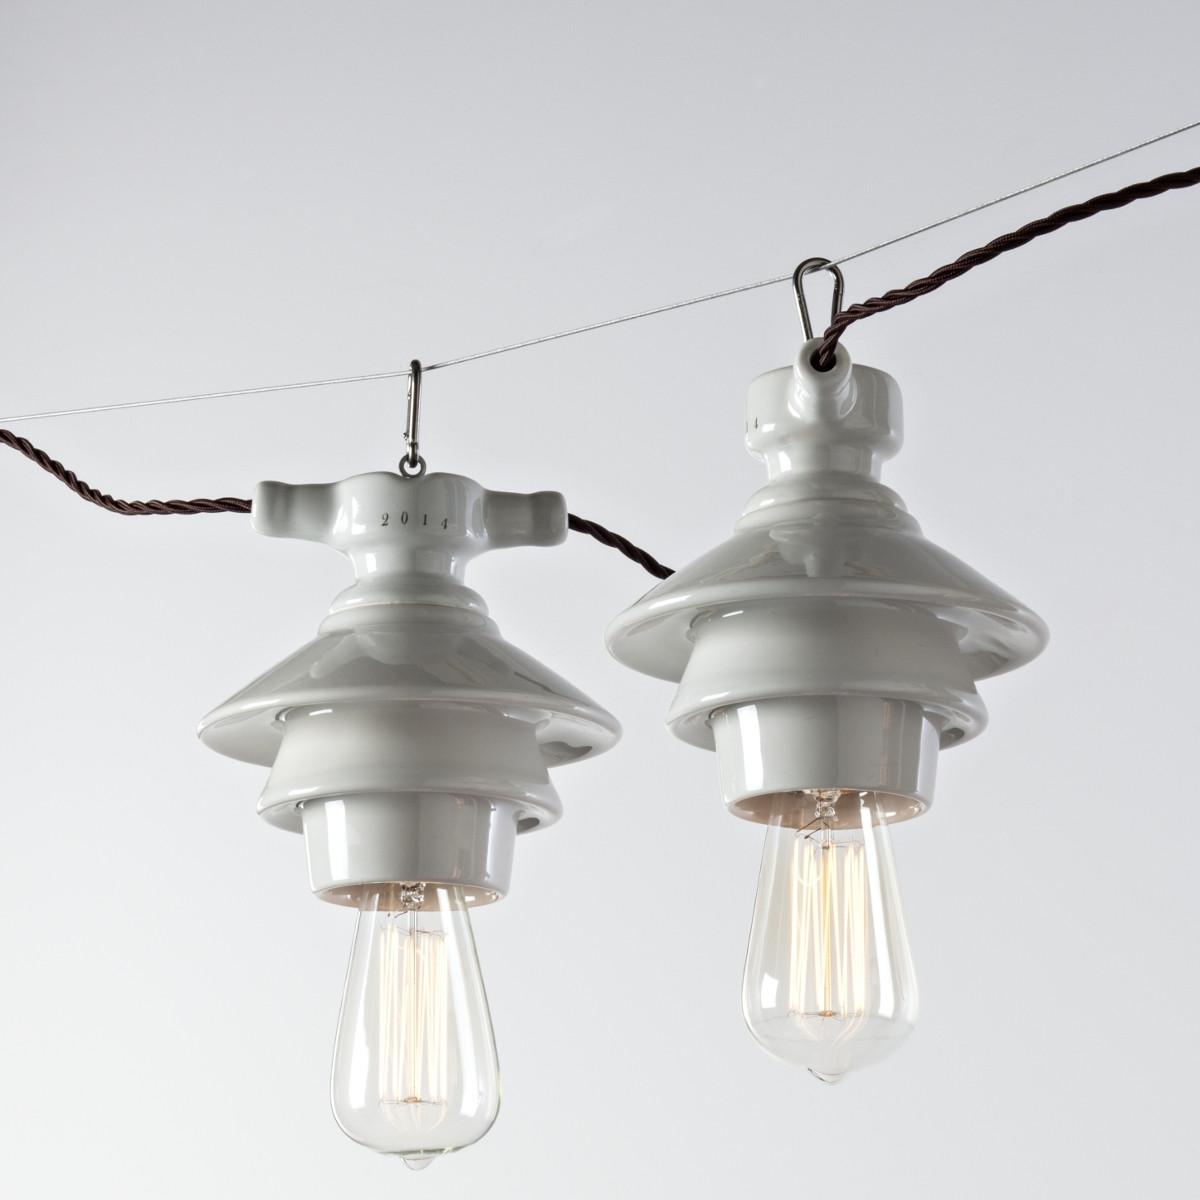 Seilsysteme Beleuchtung  Loft Beleuchtung Mehrflammiges Seilsystem mit